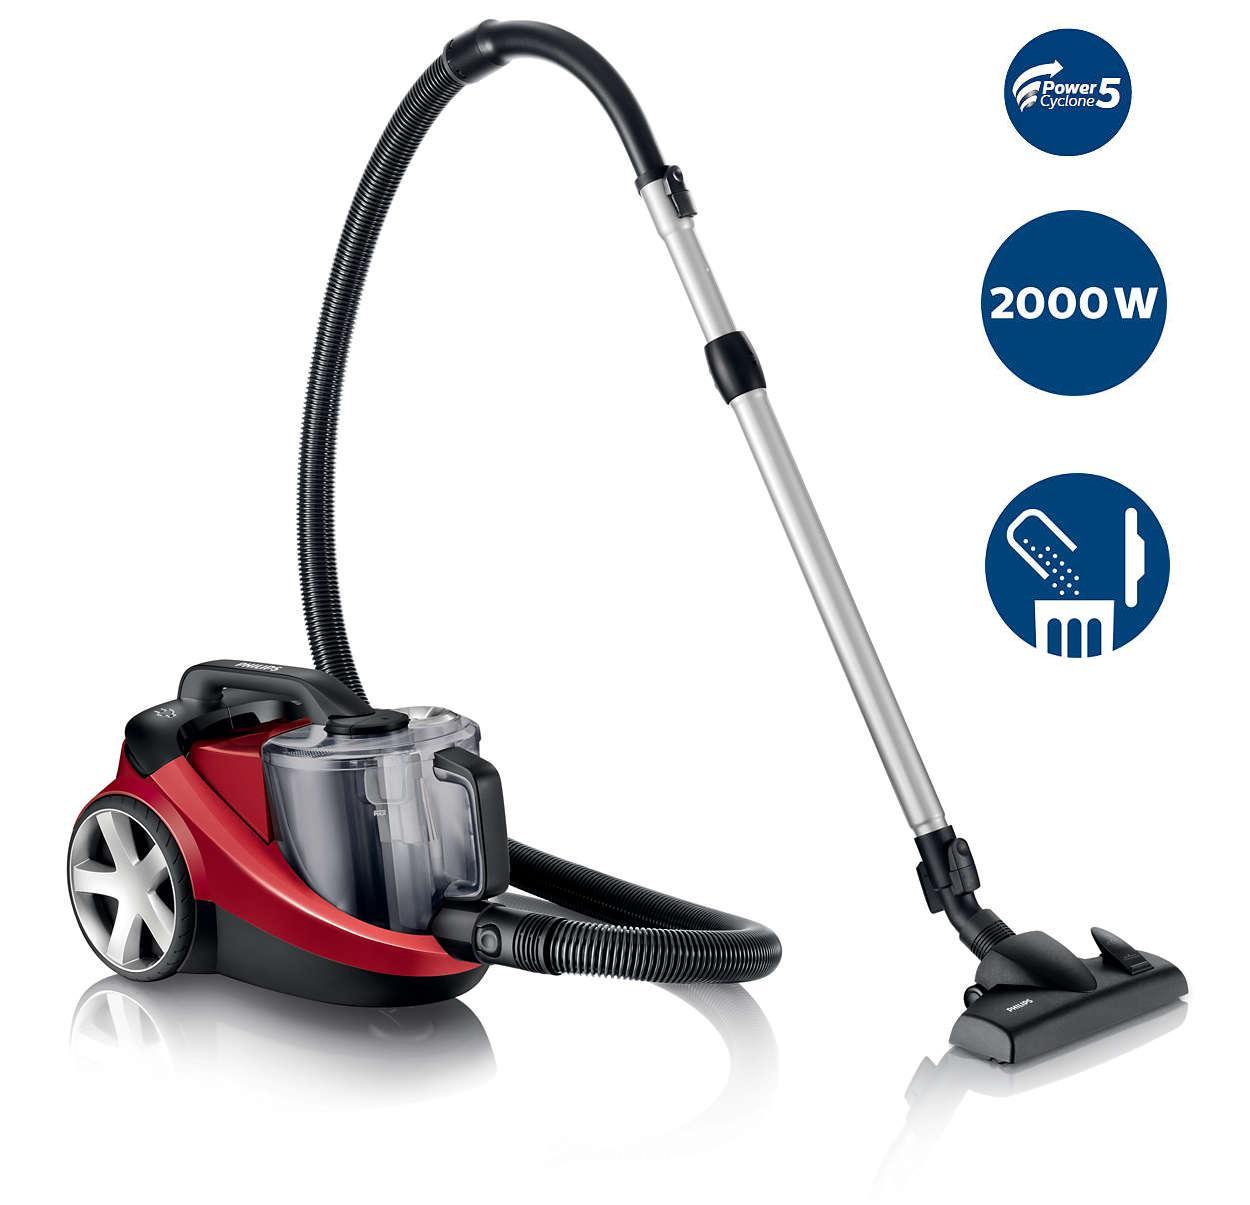 Cheapest Philips Fc8760 61 Powerpro Vacuum Cleaner Online